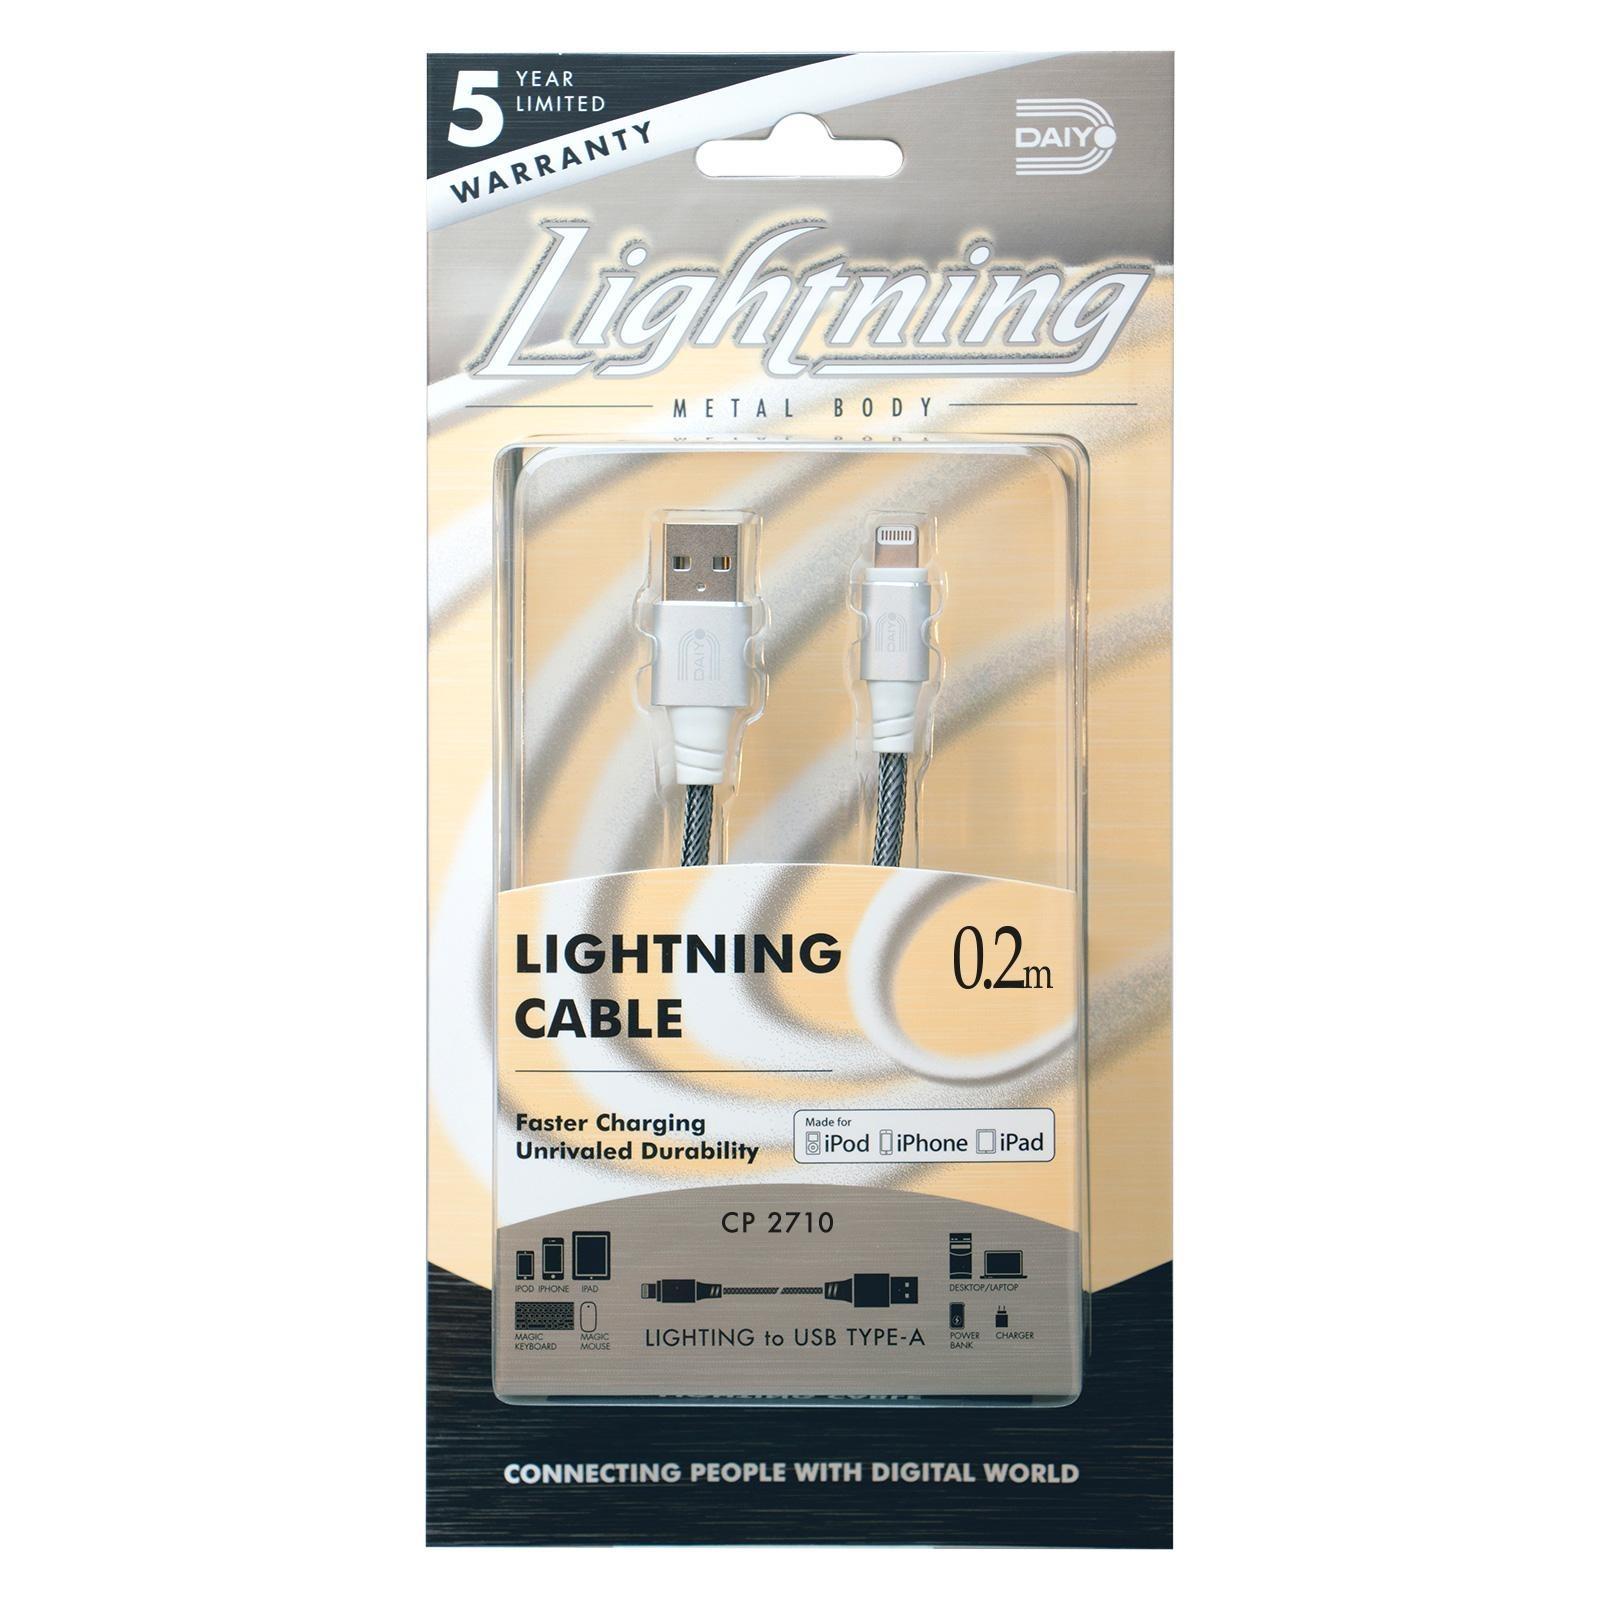 Daiyo Lightning Cable 0.2M (Silver)